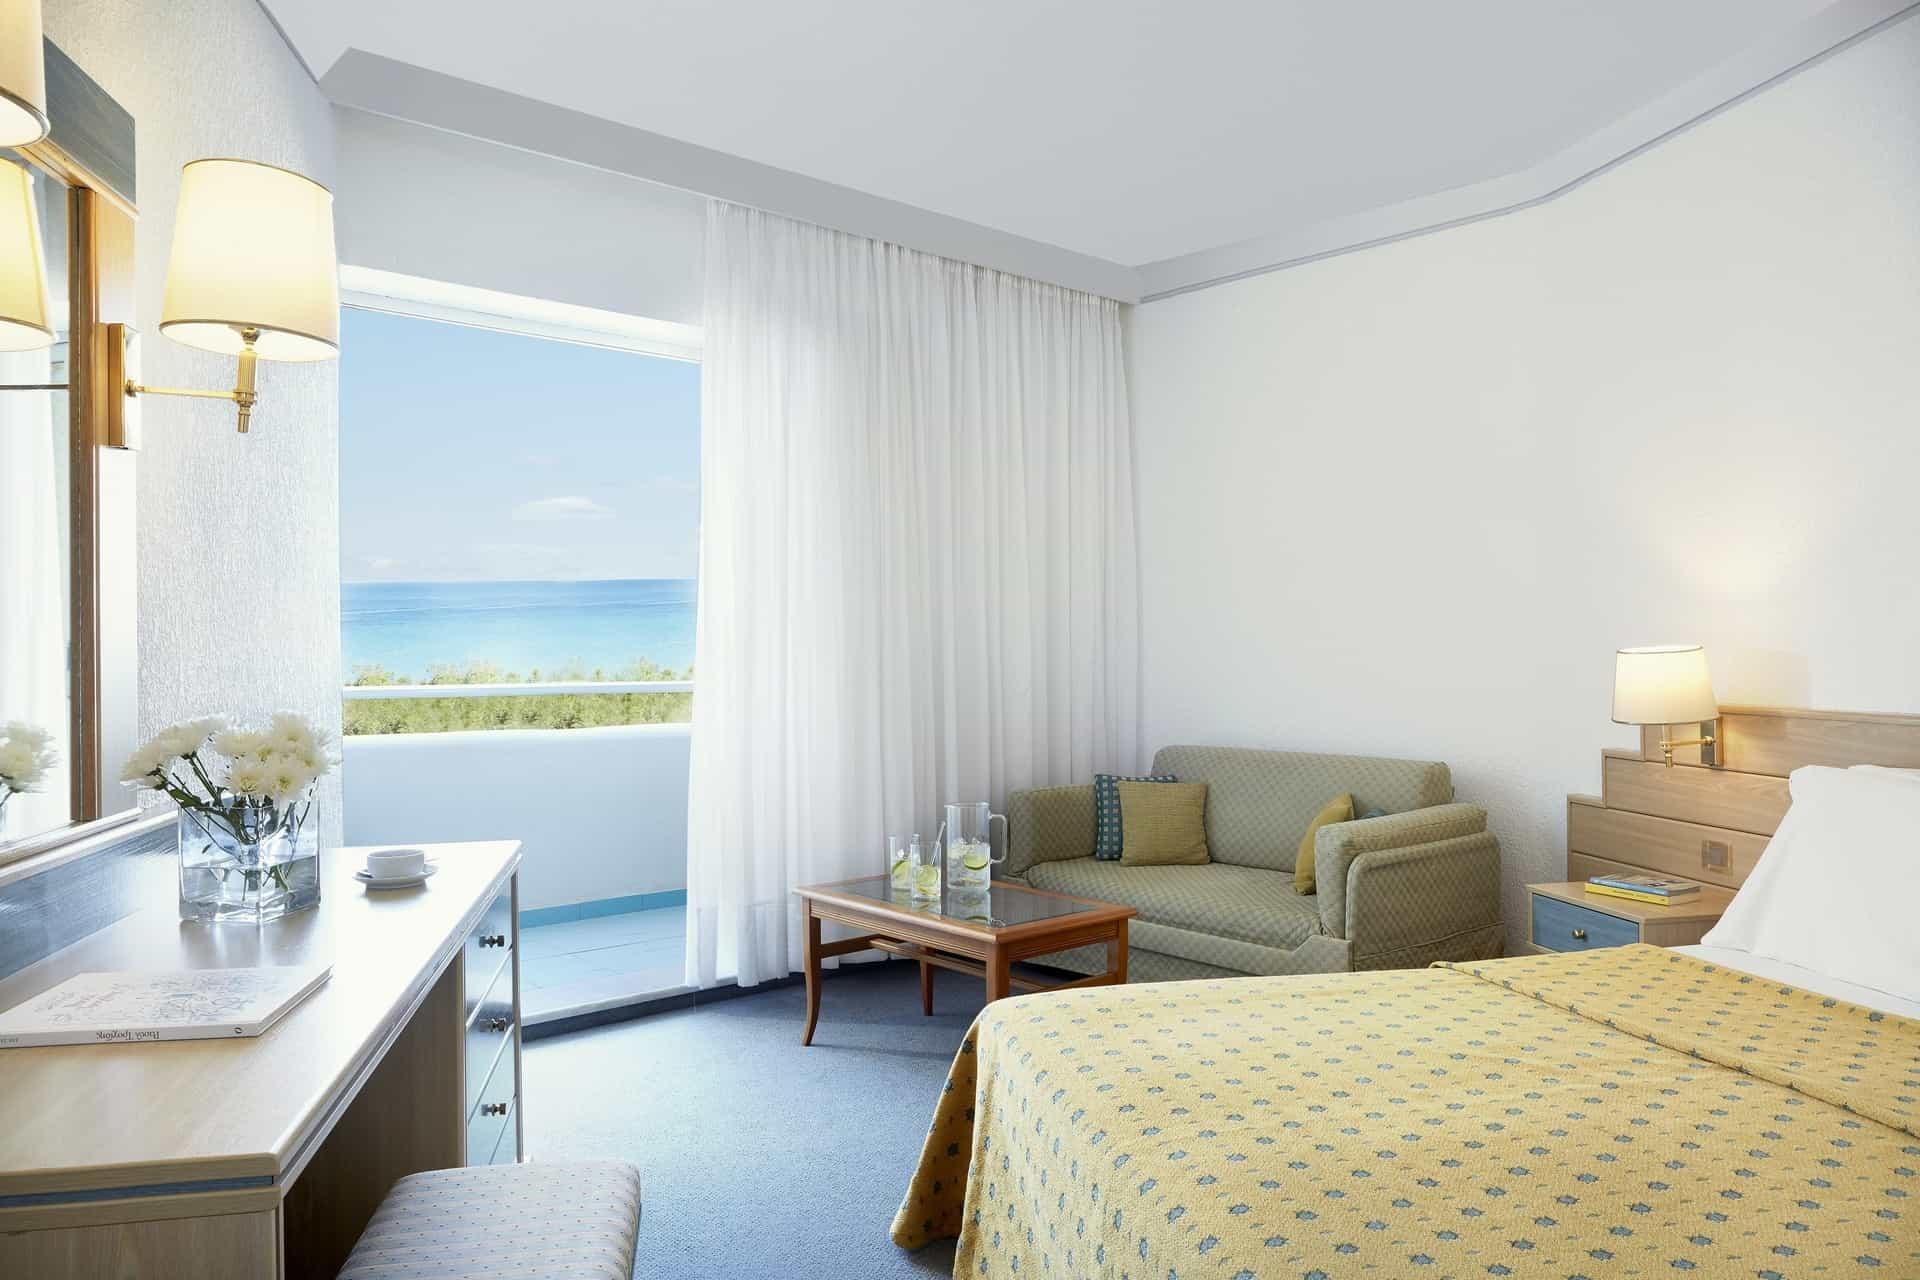 Stay at the Pallini Beach Hotel, Kassandra with Sunway